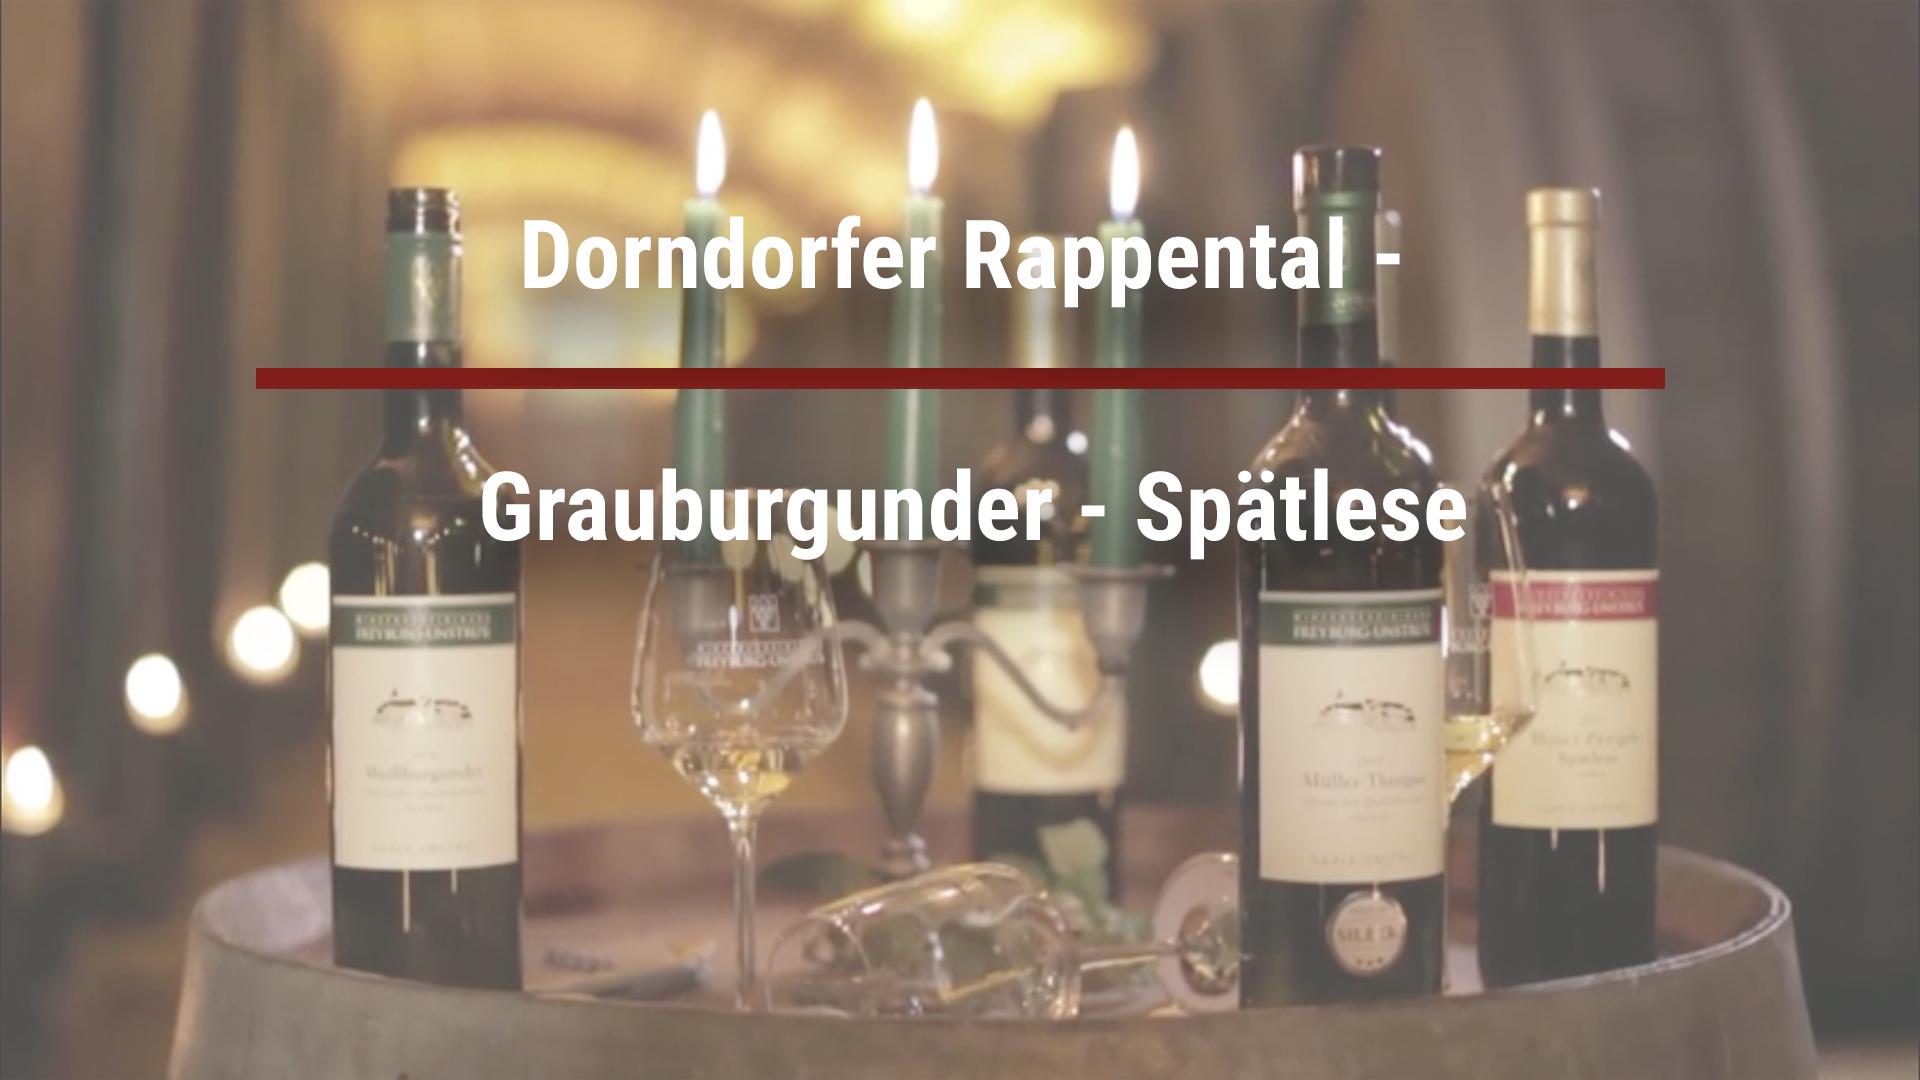 Dorndorfer Rappental – Grauburgunder – Spätlese